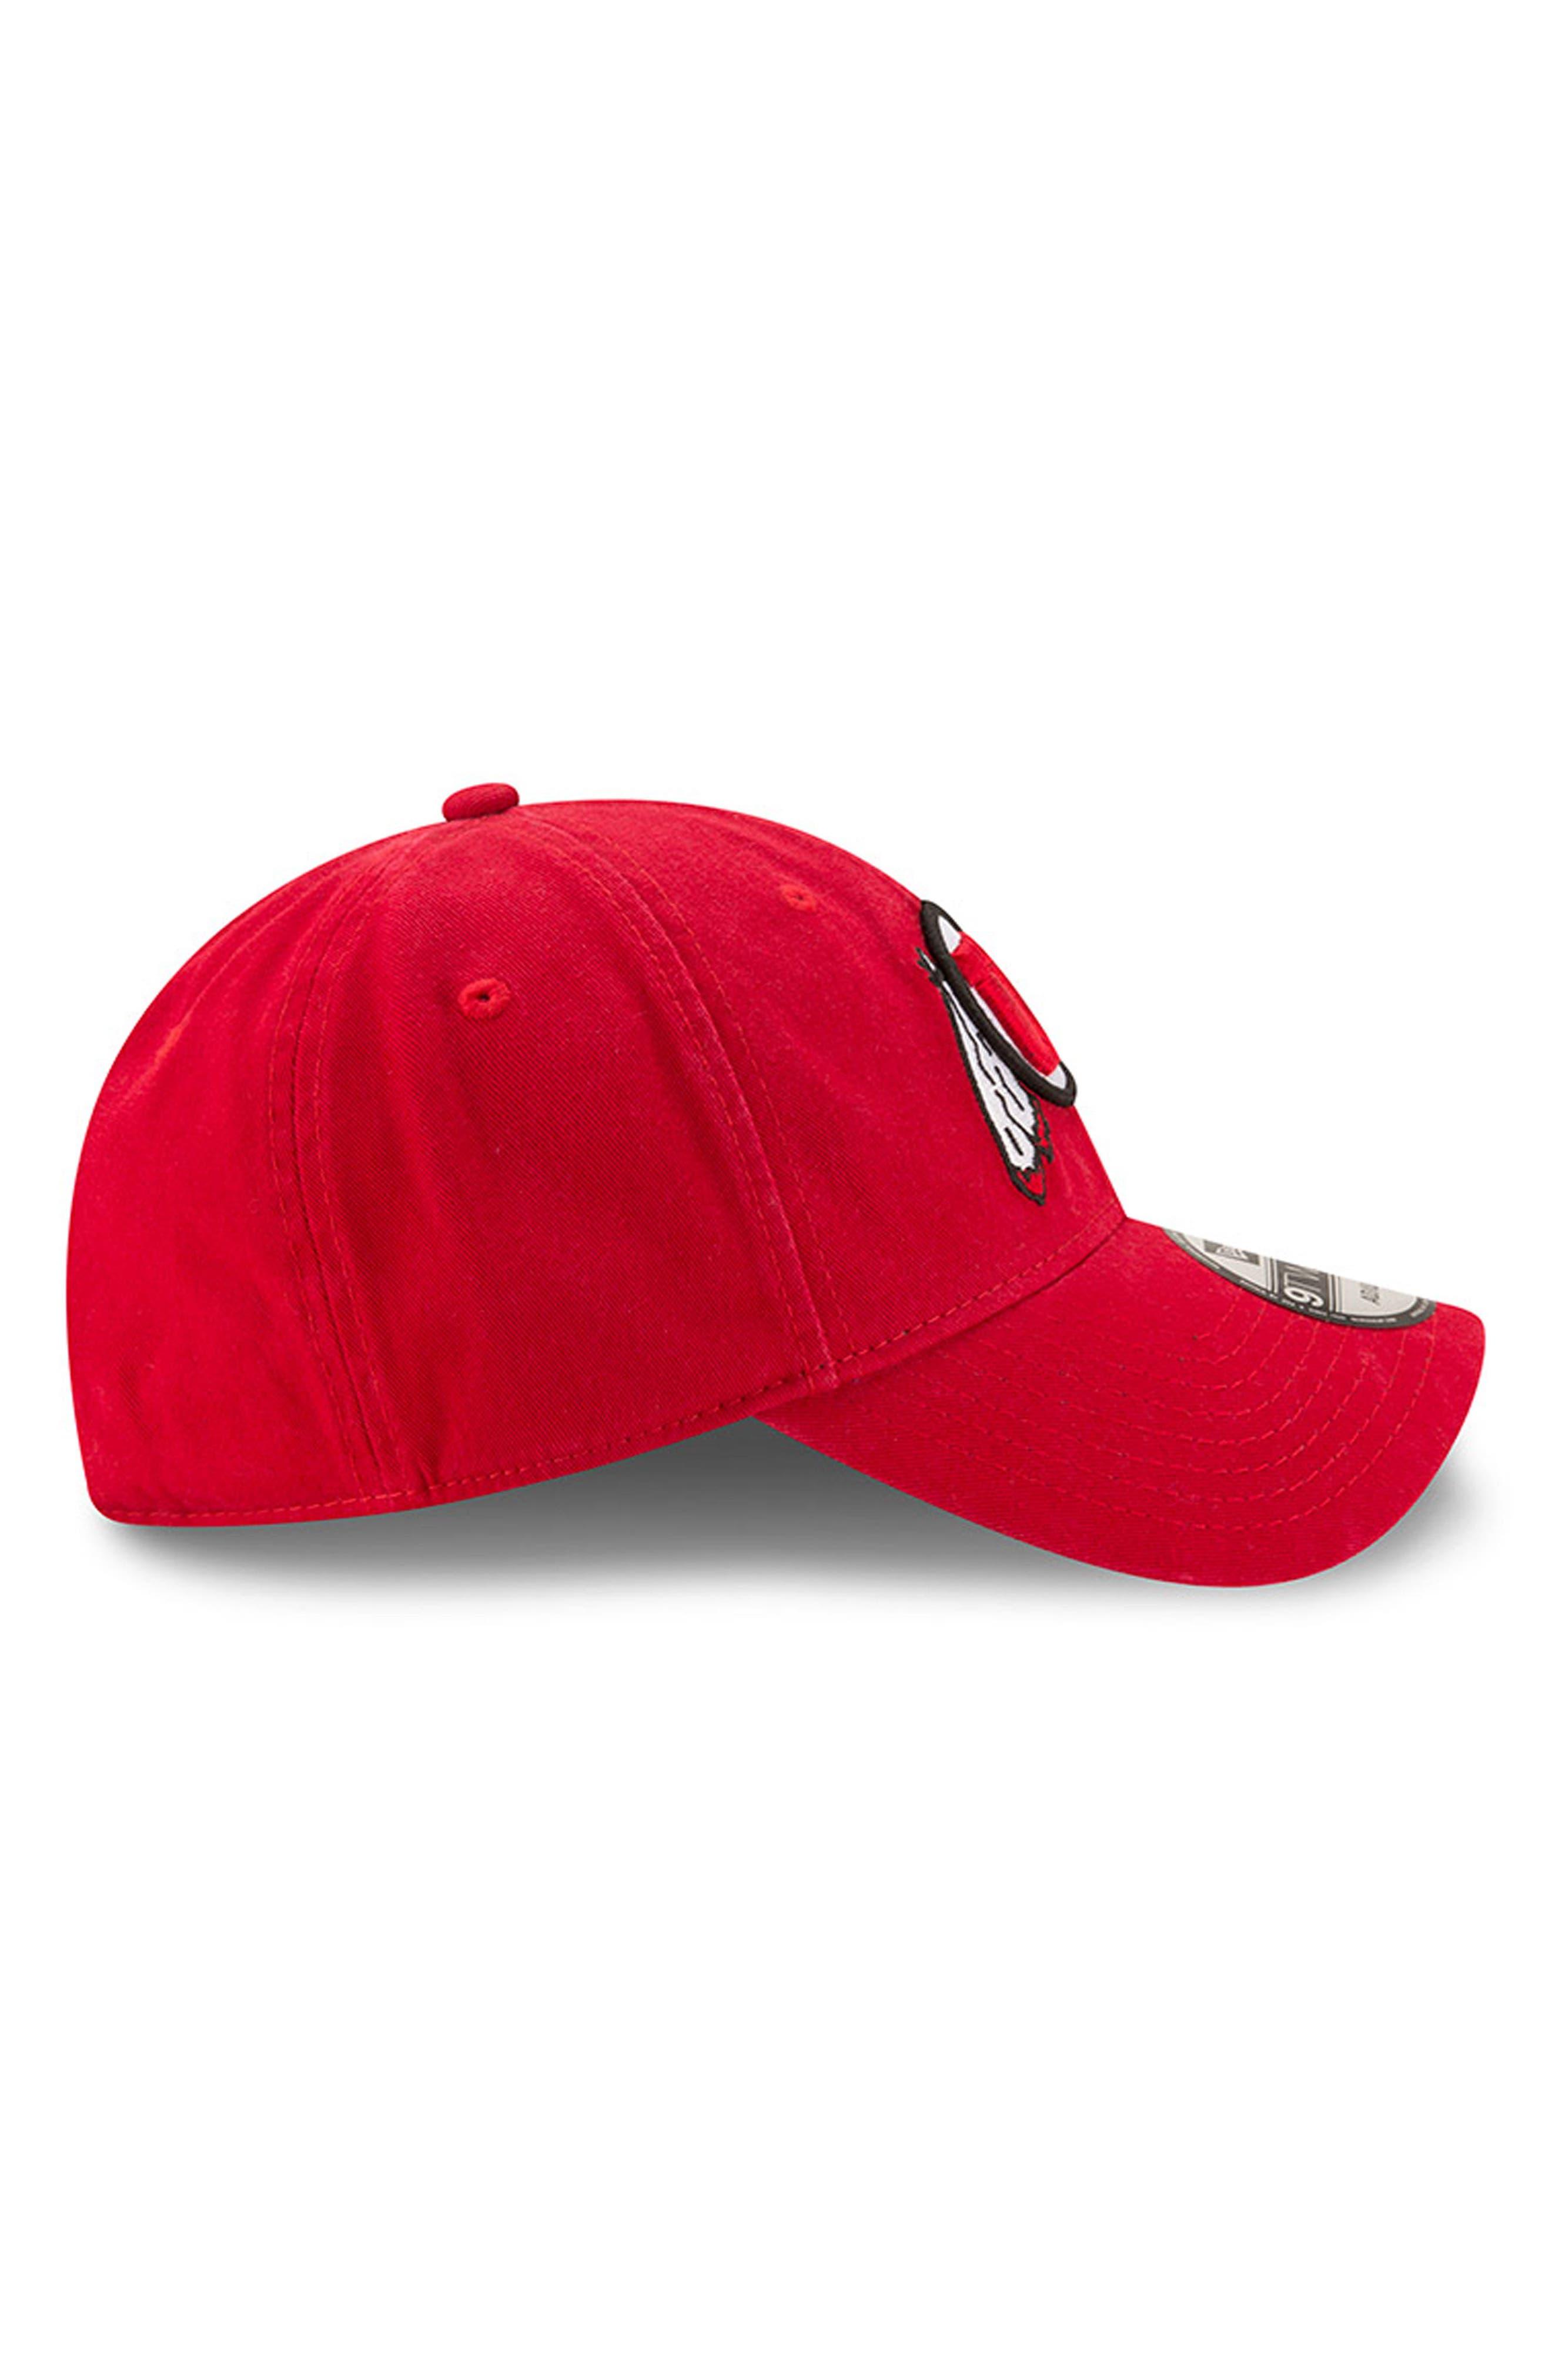 New Era Collegiate Core Classic - Utah Utes Baseball Cap,                             Alternate thumbnail 4, color,                             600